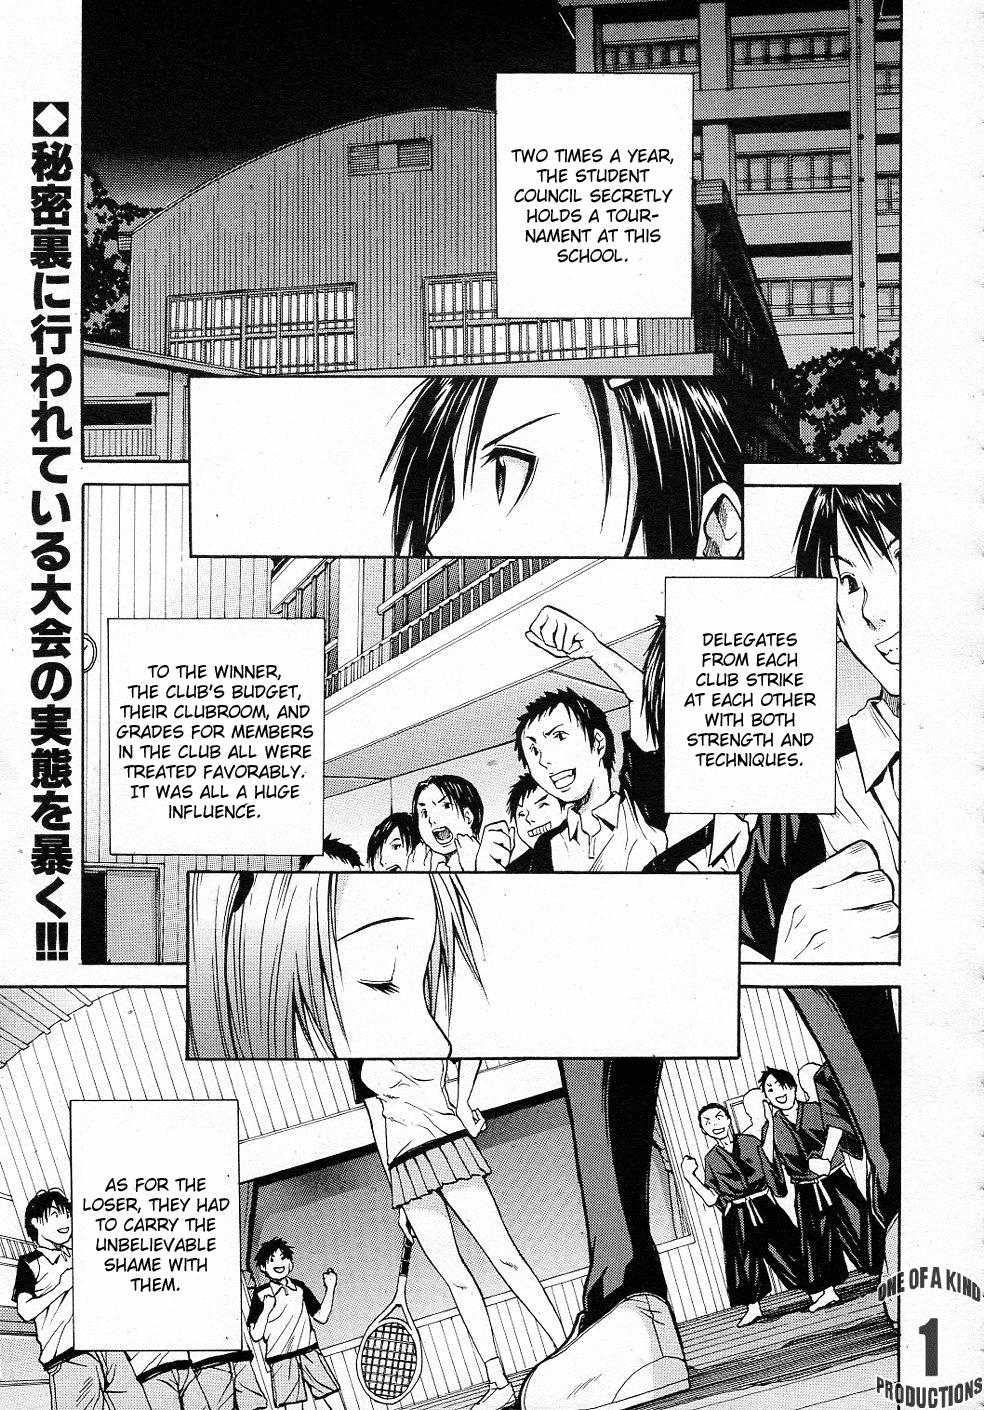 [Chiyou Yoyuchi] Rinkan Gakuen ~Haibokusha-tachi wa Midaremau~   Gang Rape School: The Losers Dance Indecently [English] 5